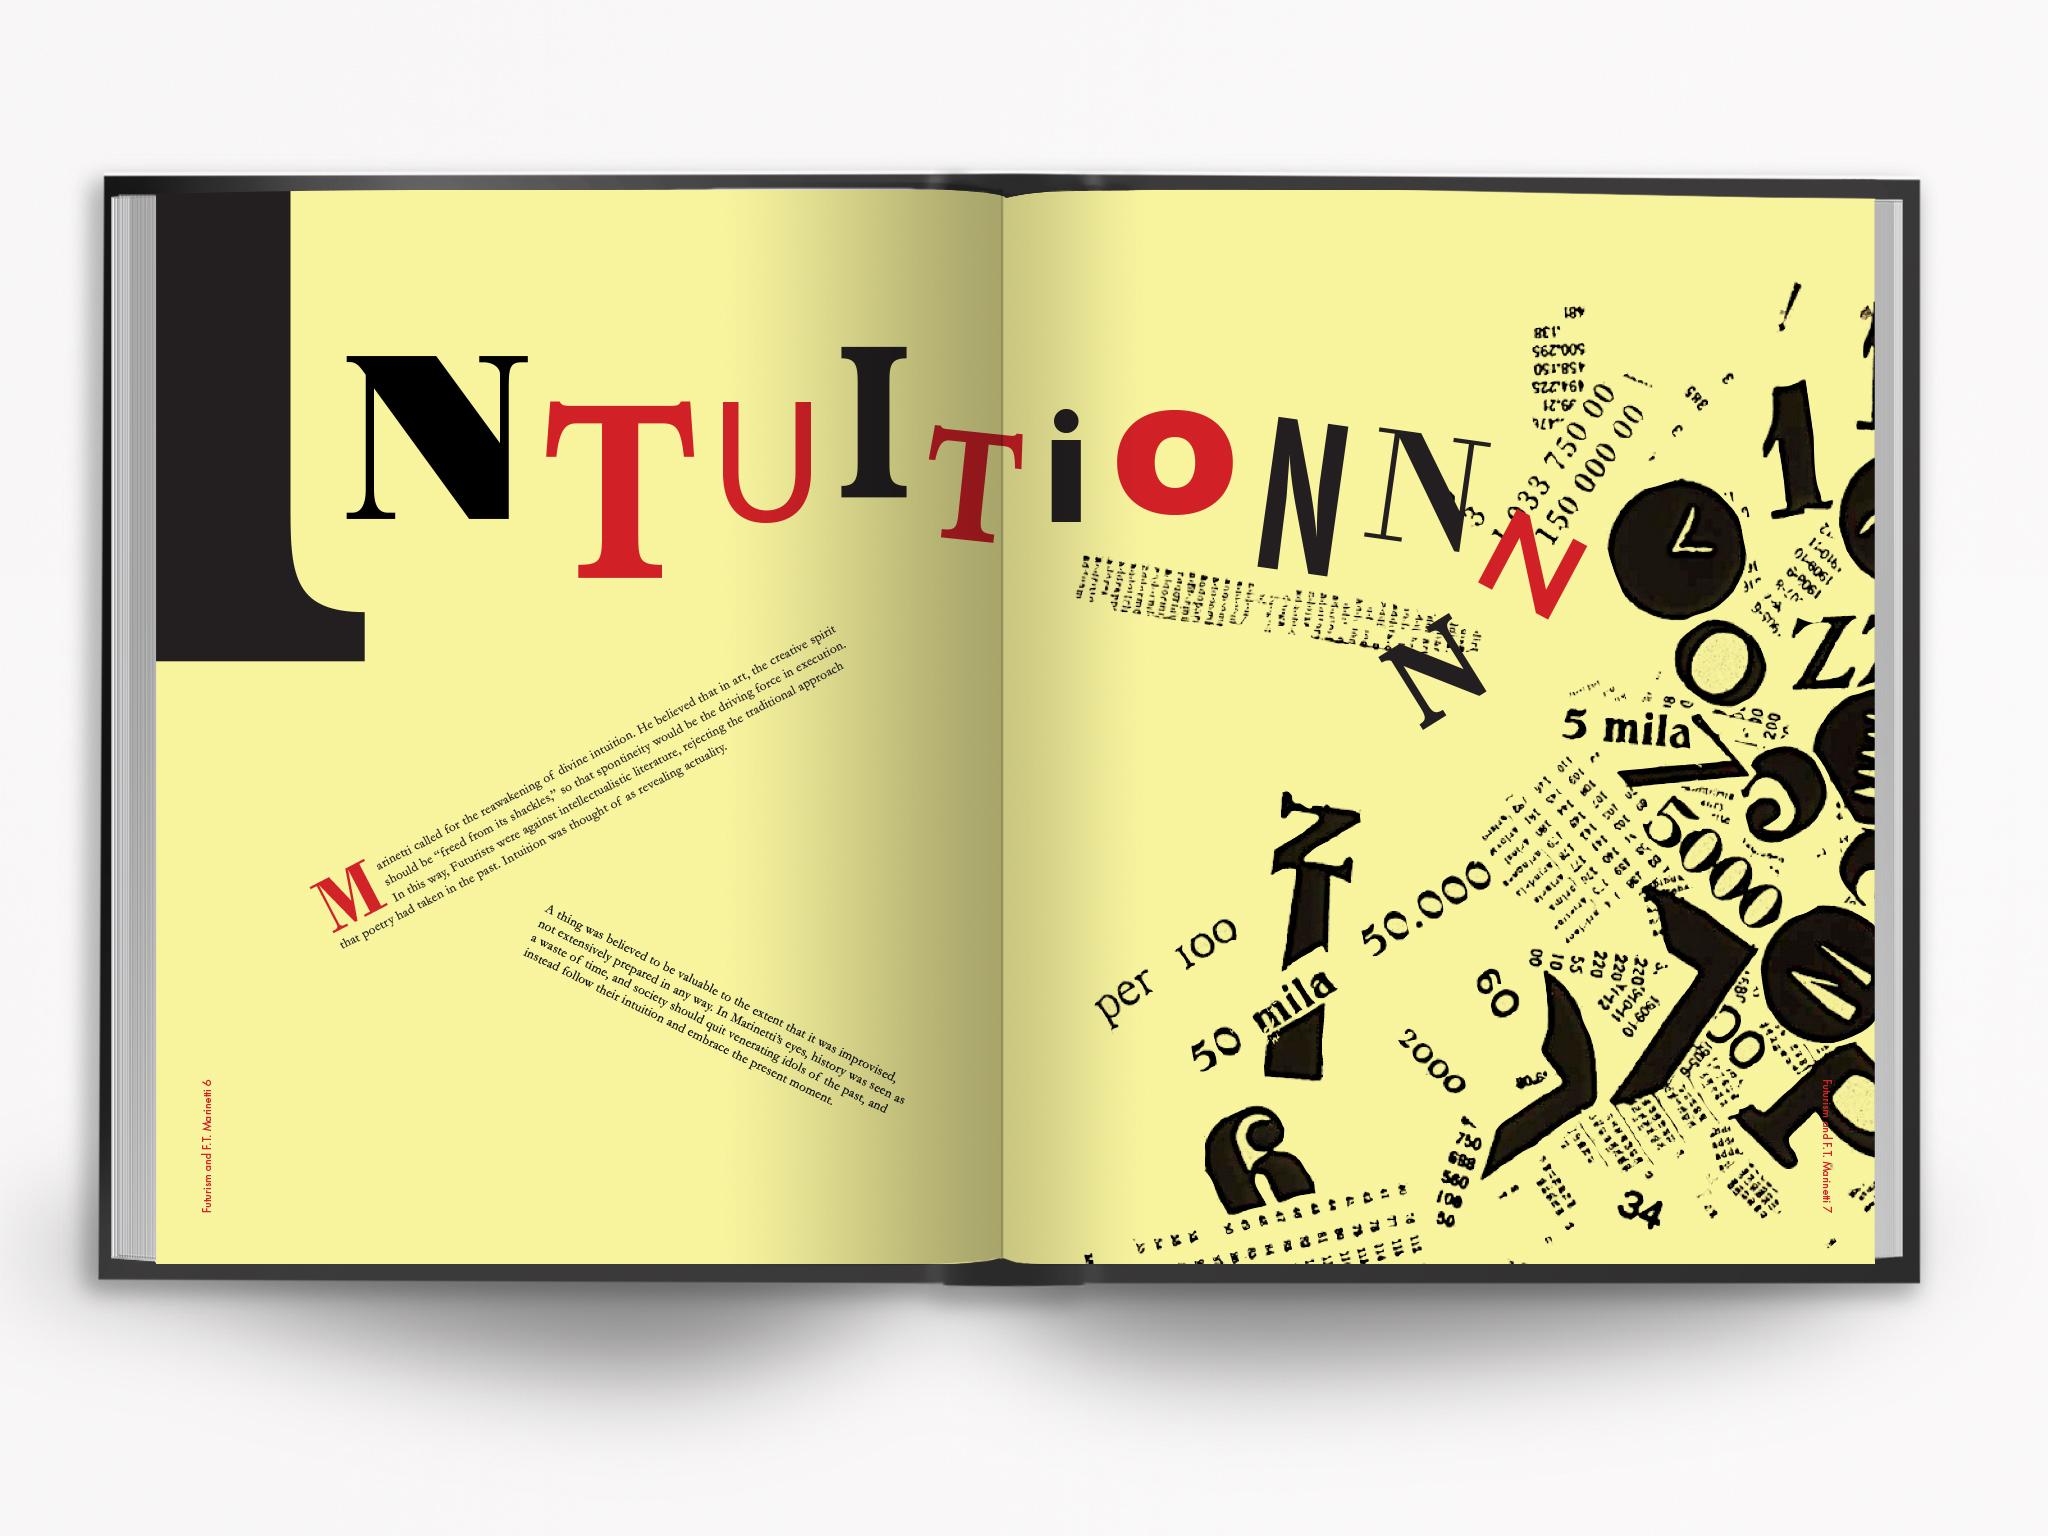 7futurismspread.jpg